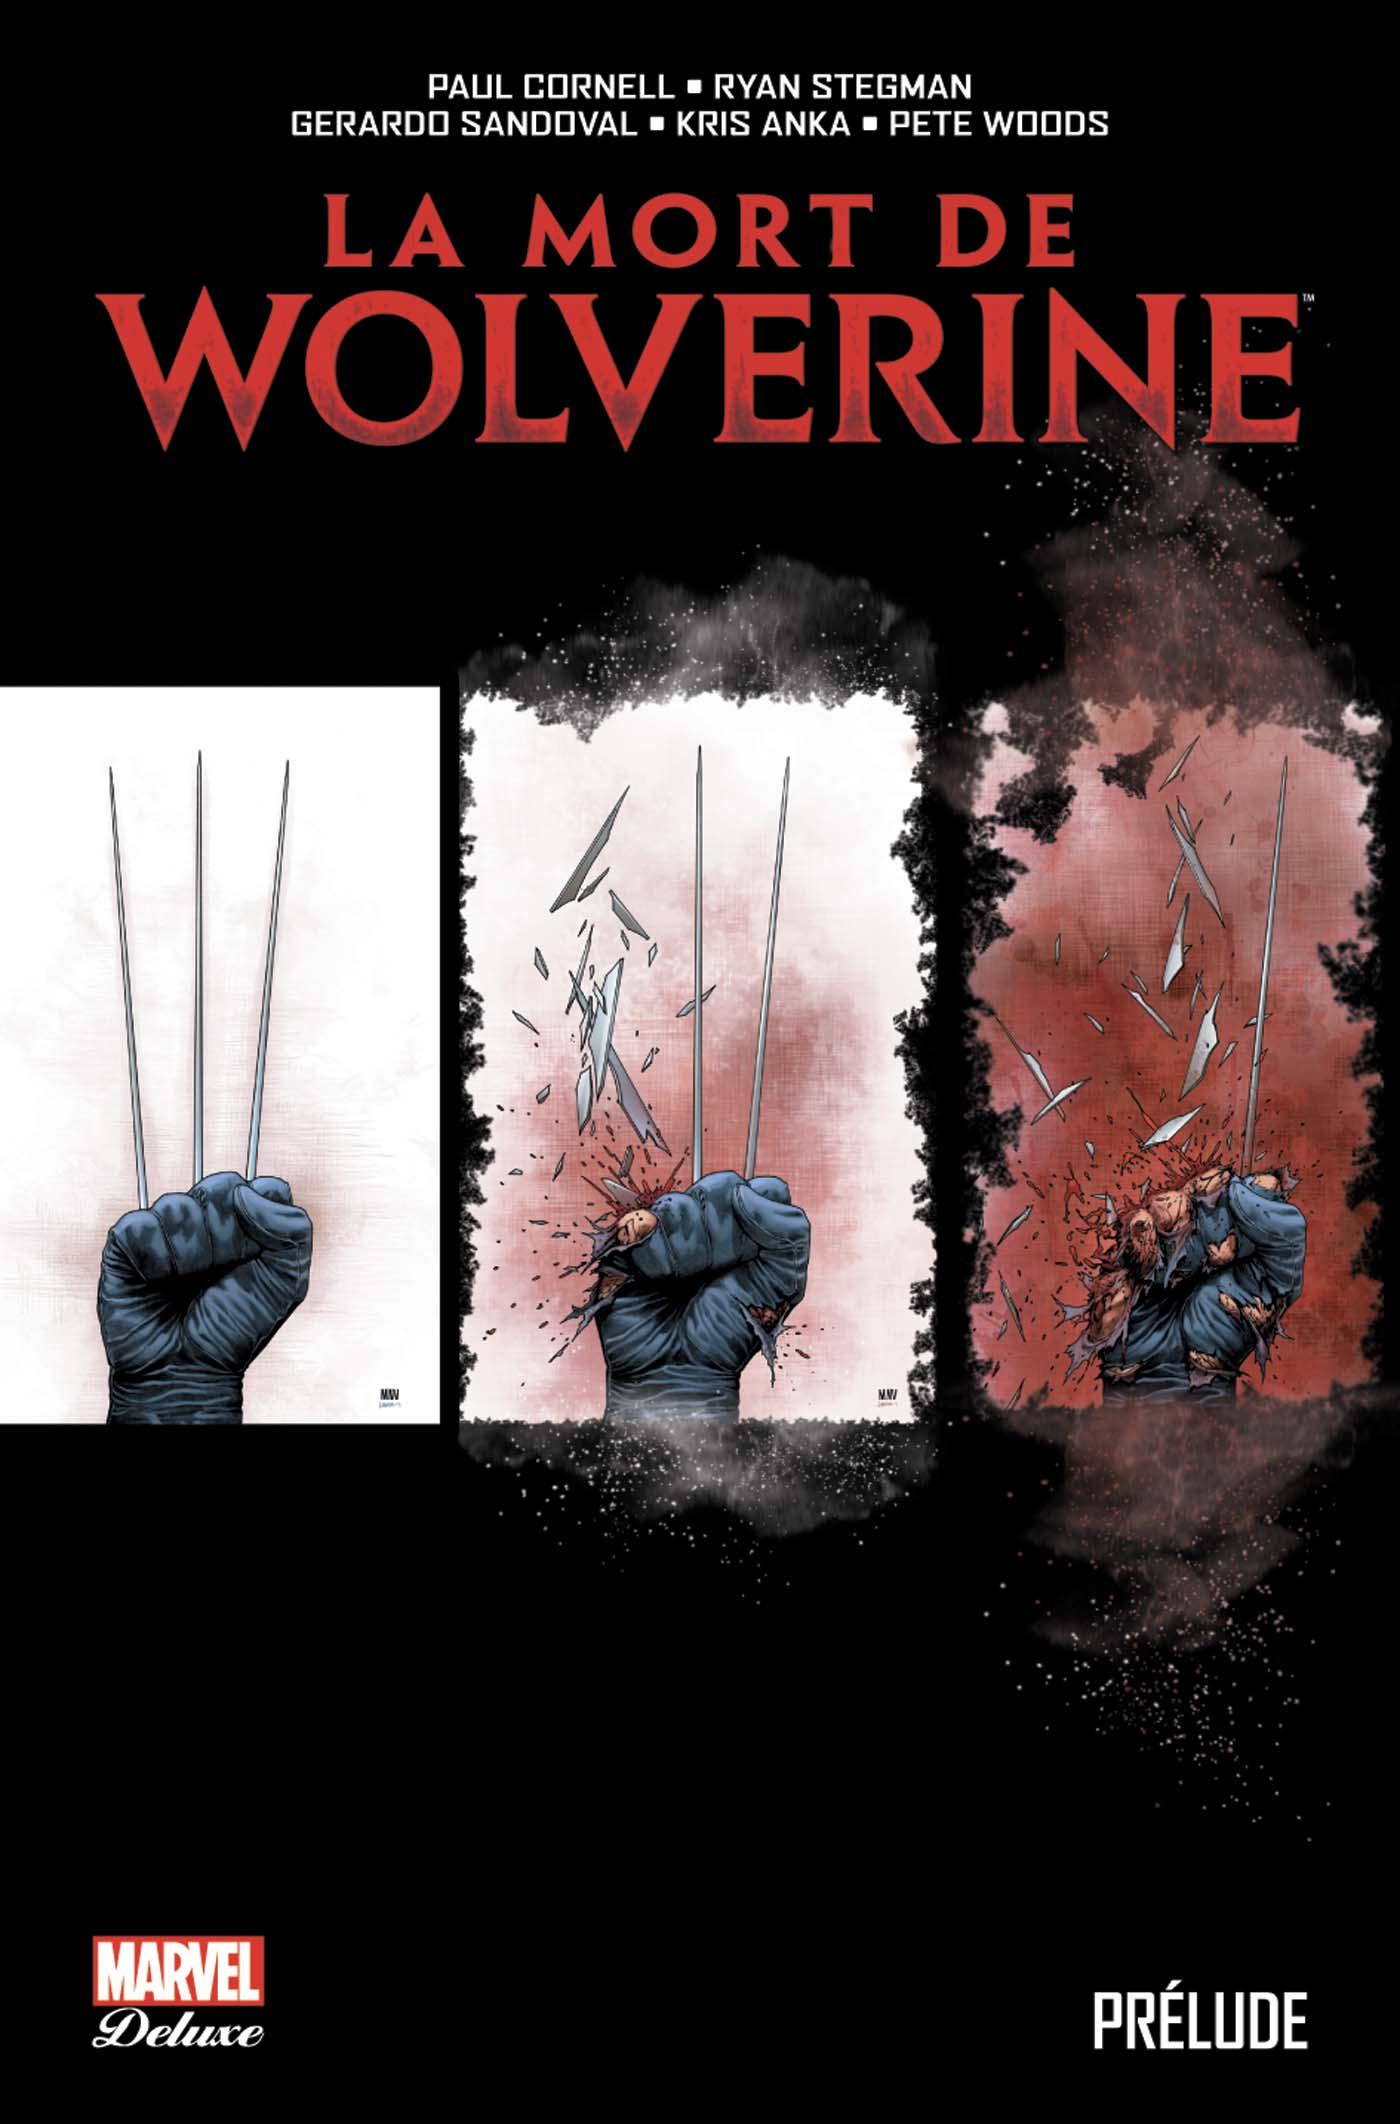 La Mort de Wolverine - Prelude 1 - PRÉLUDE